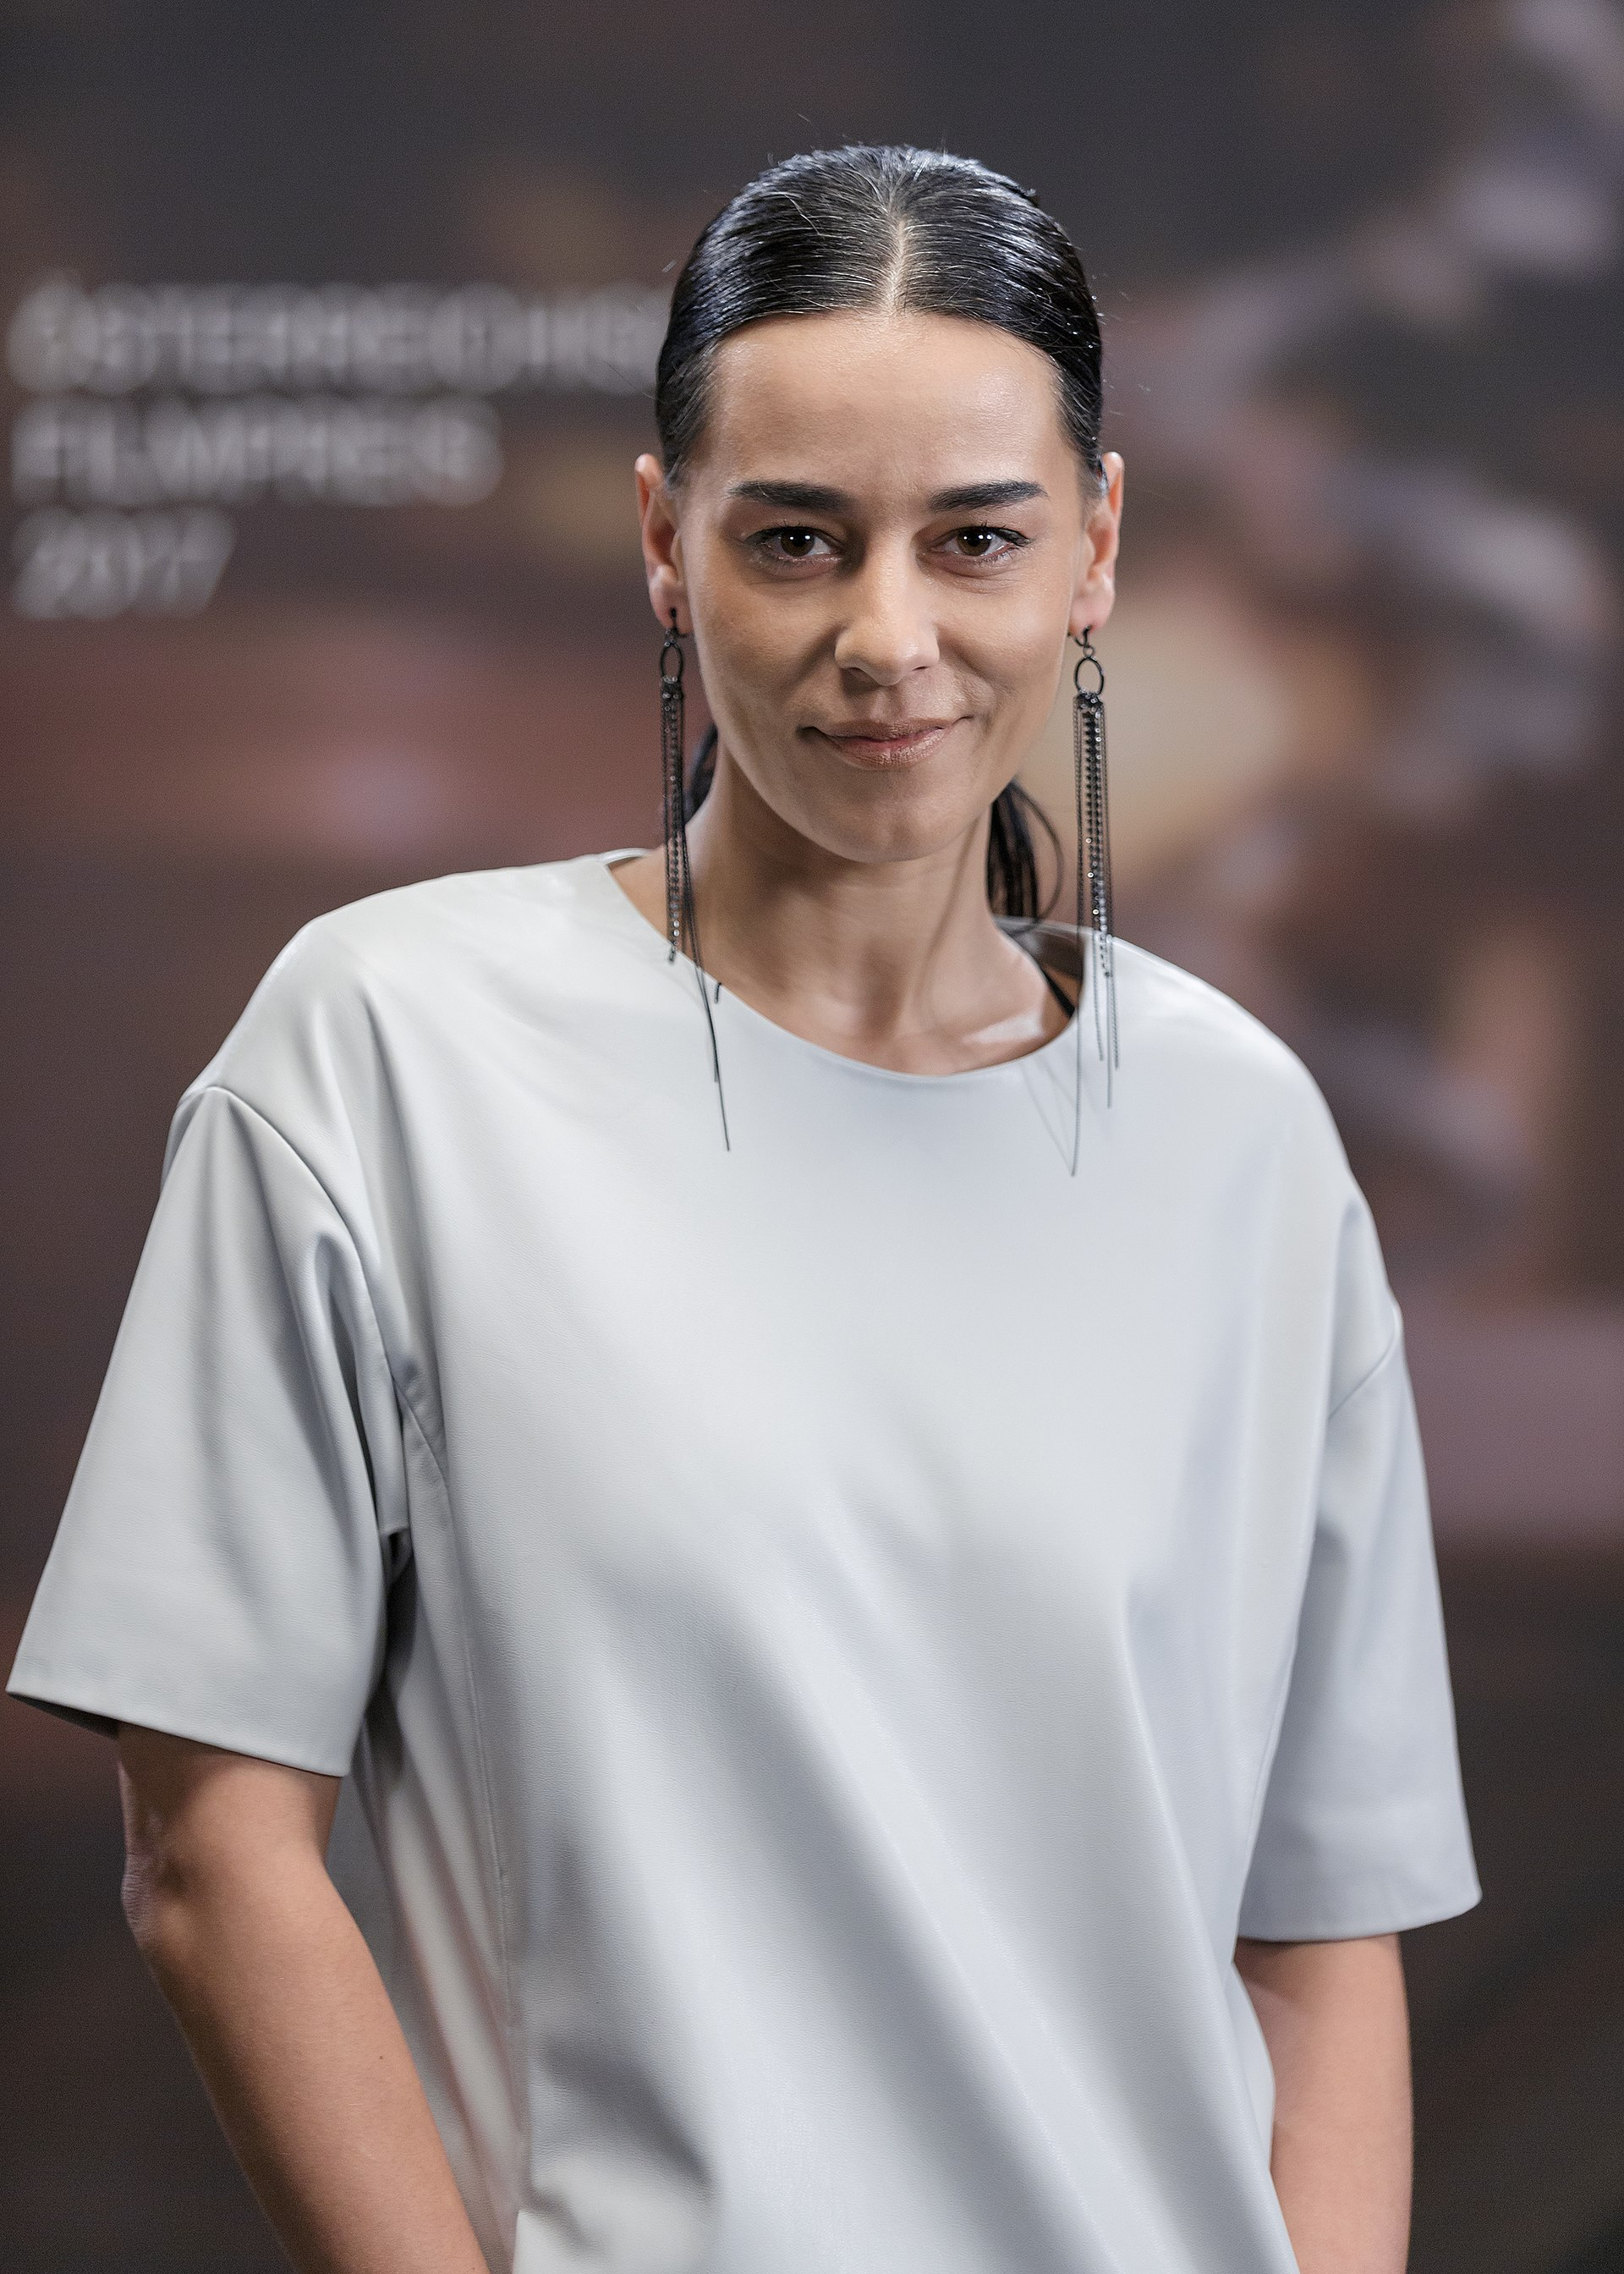 Edita Malovčić – Wikipedia